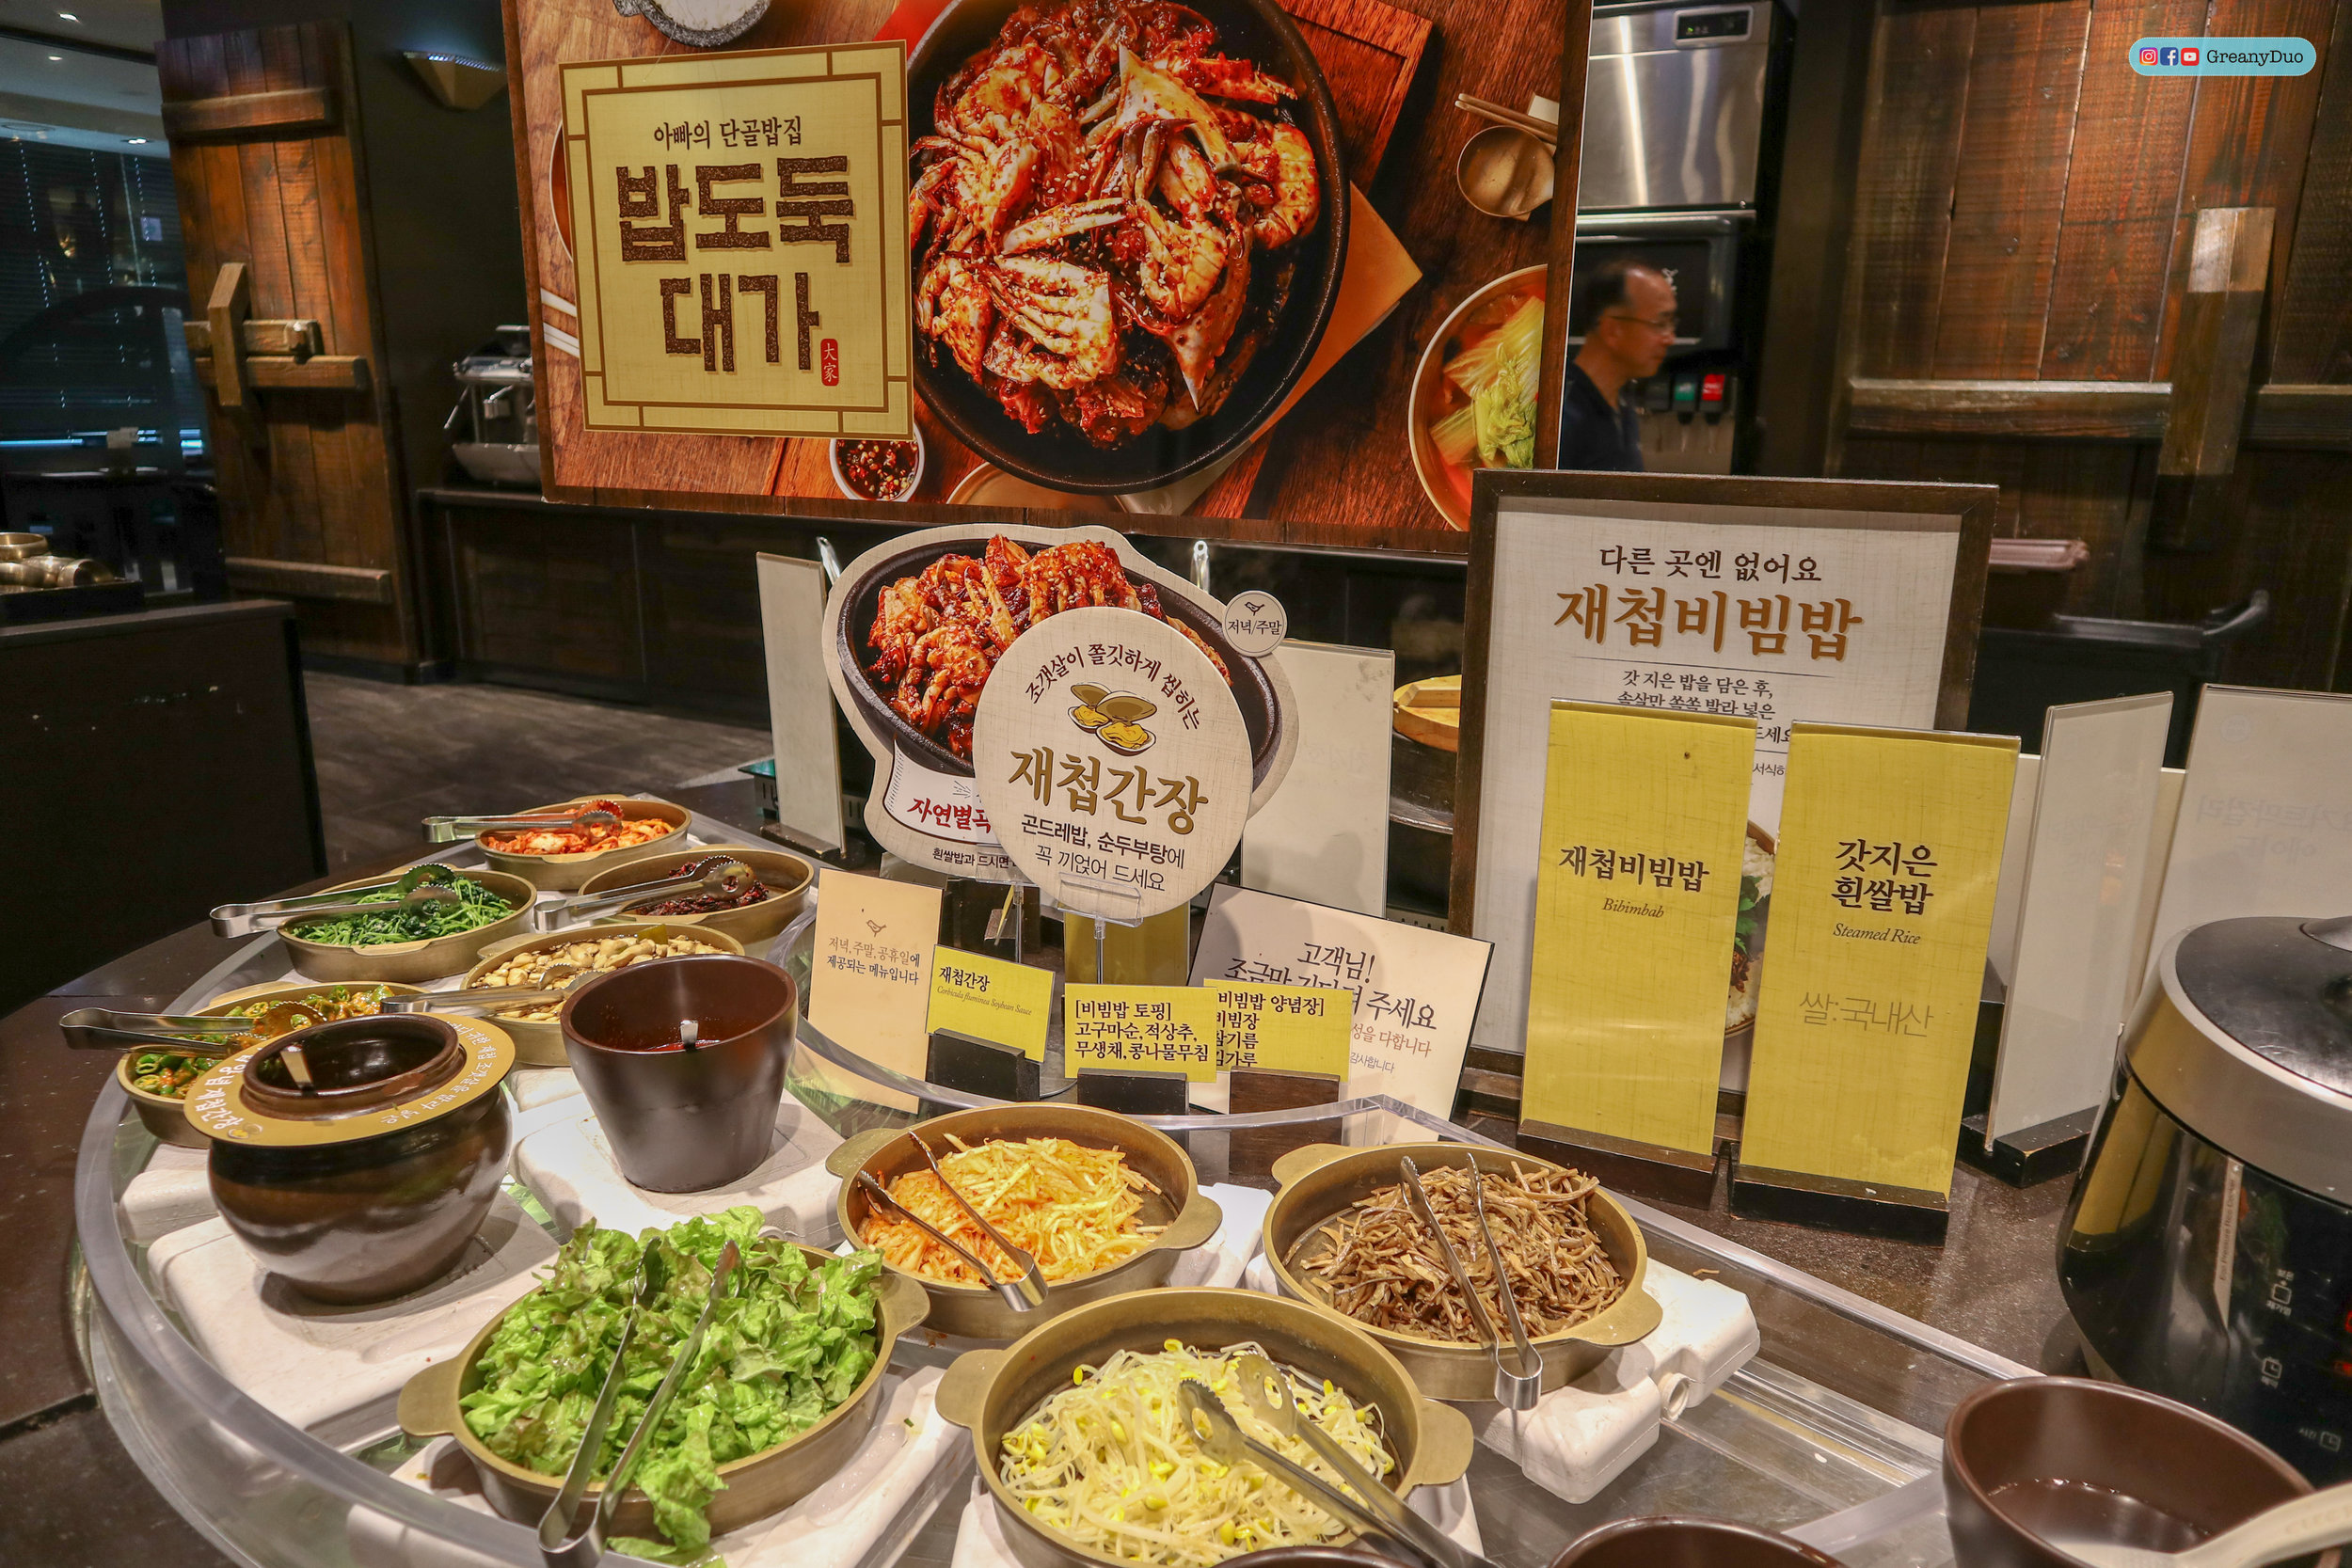 diy bibimbap, nature kitchen buffet, seoul korea